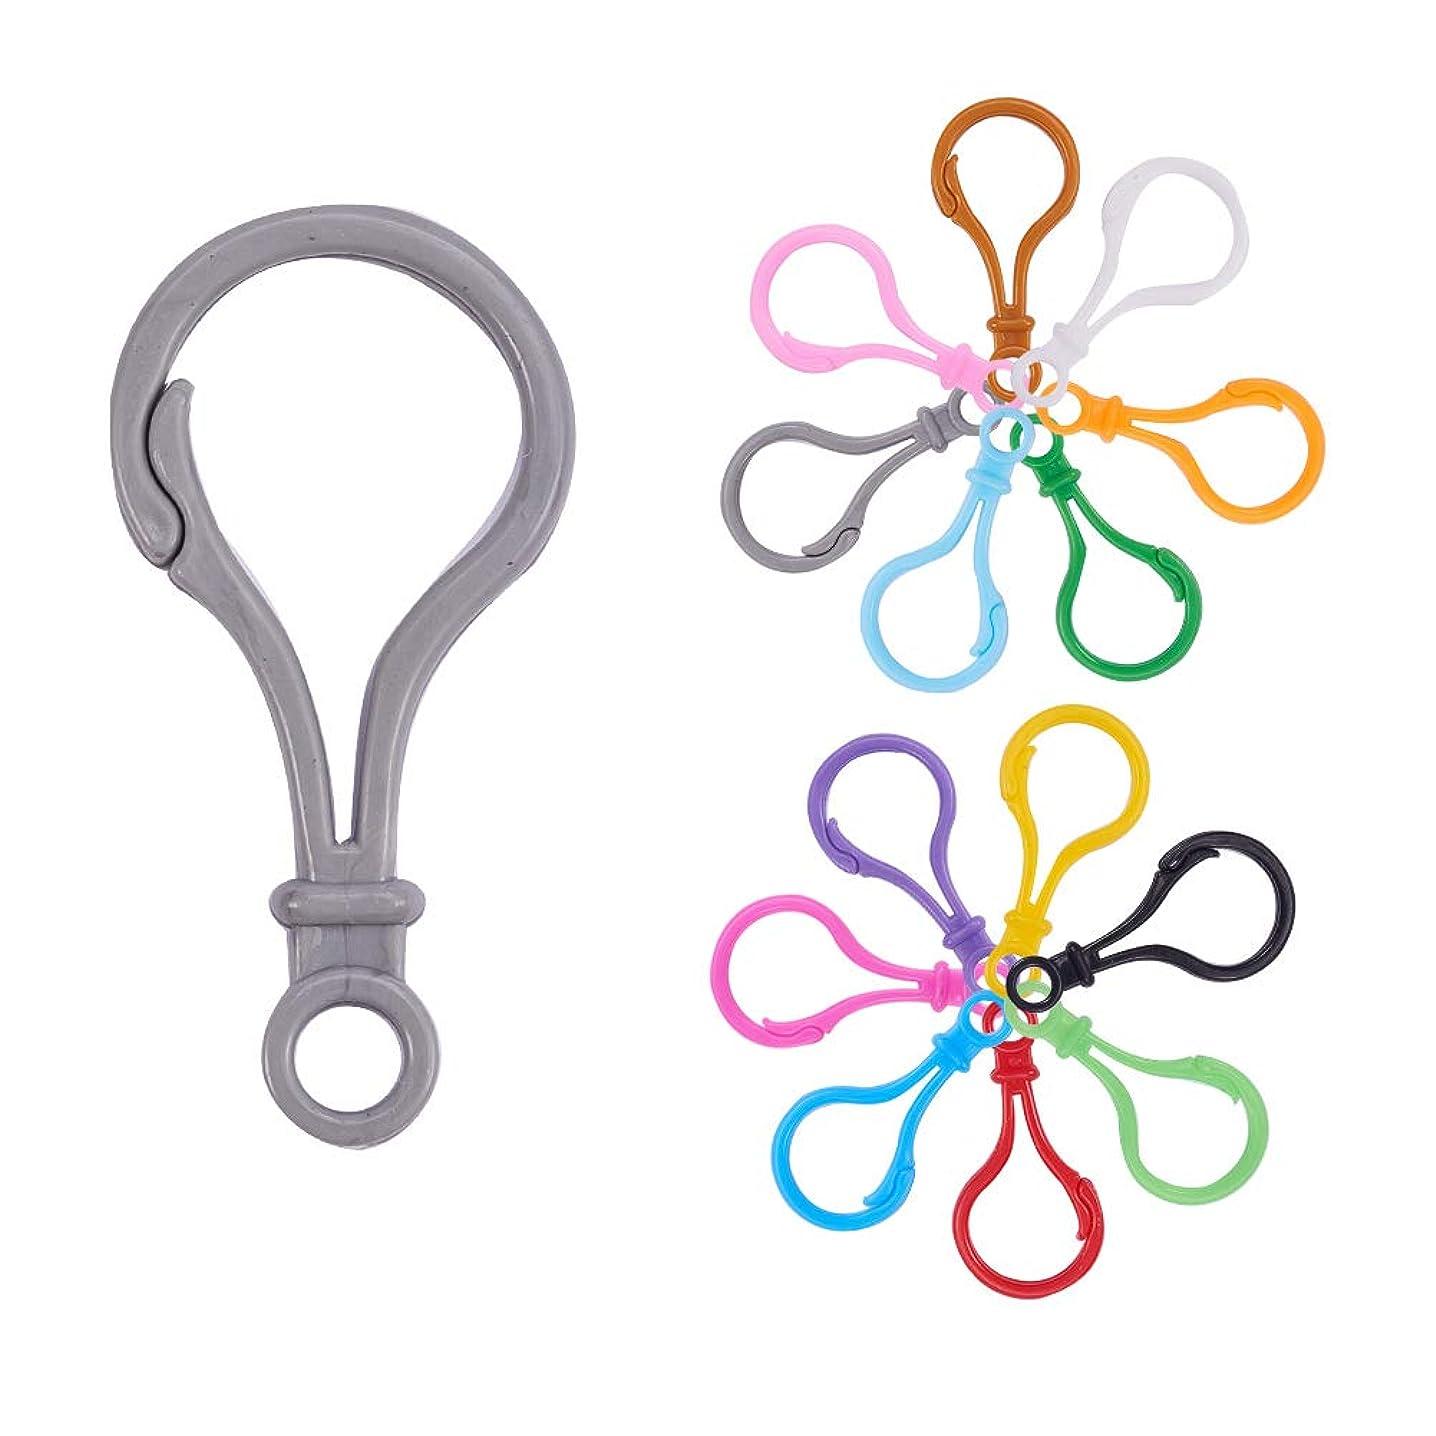 PH PandaHall 105PCS 14-Color Hard Plastic Lobster Clasps Claw Hook Keychain Key Ring Chain Keyring